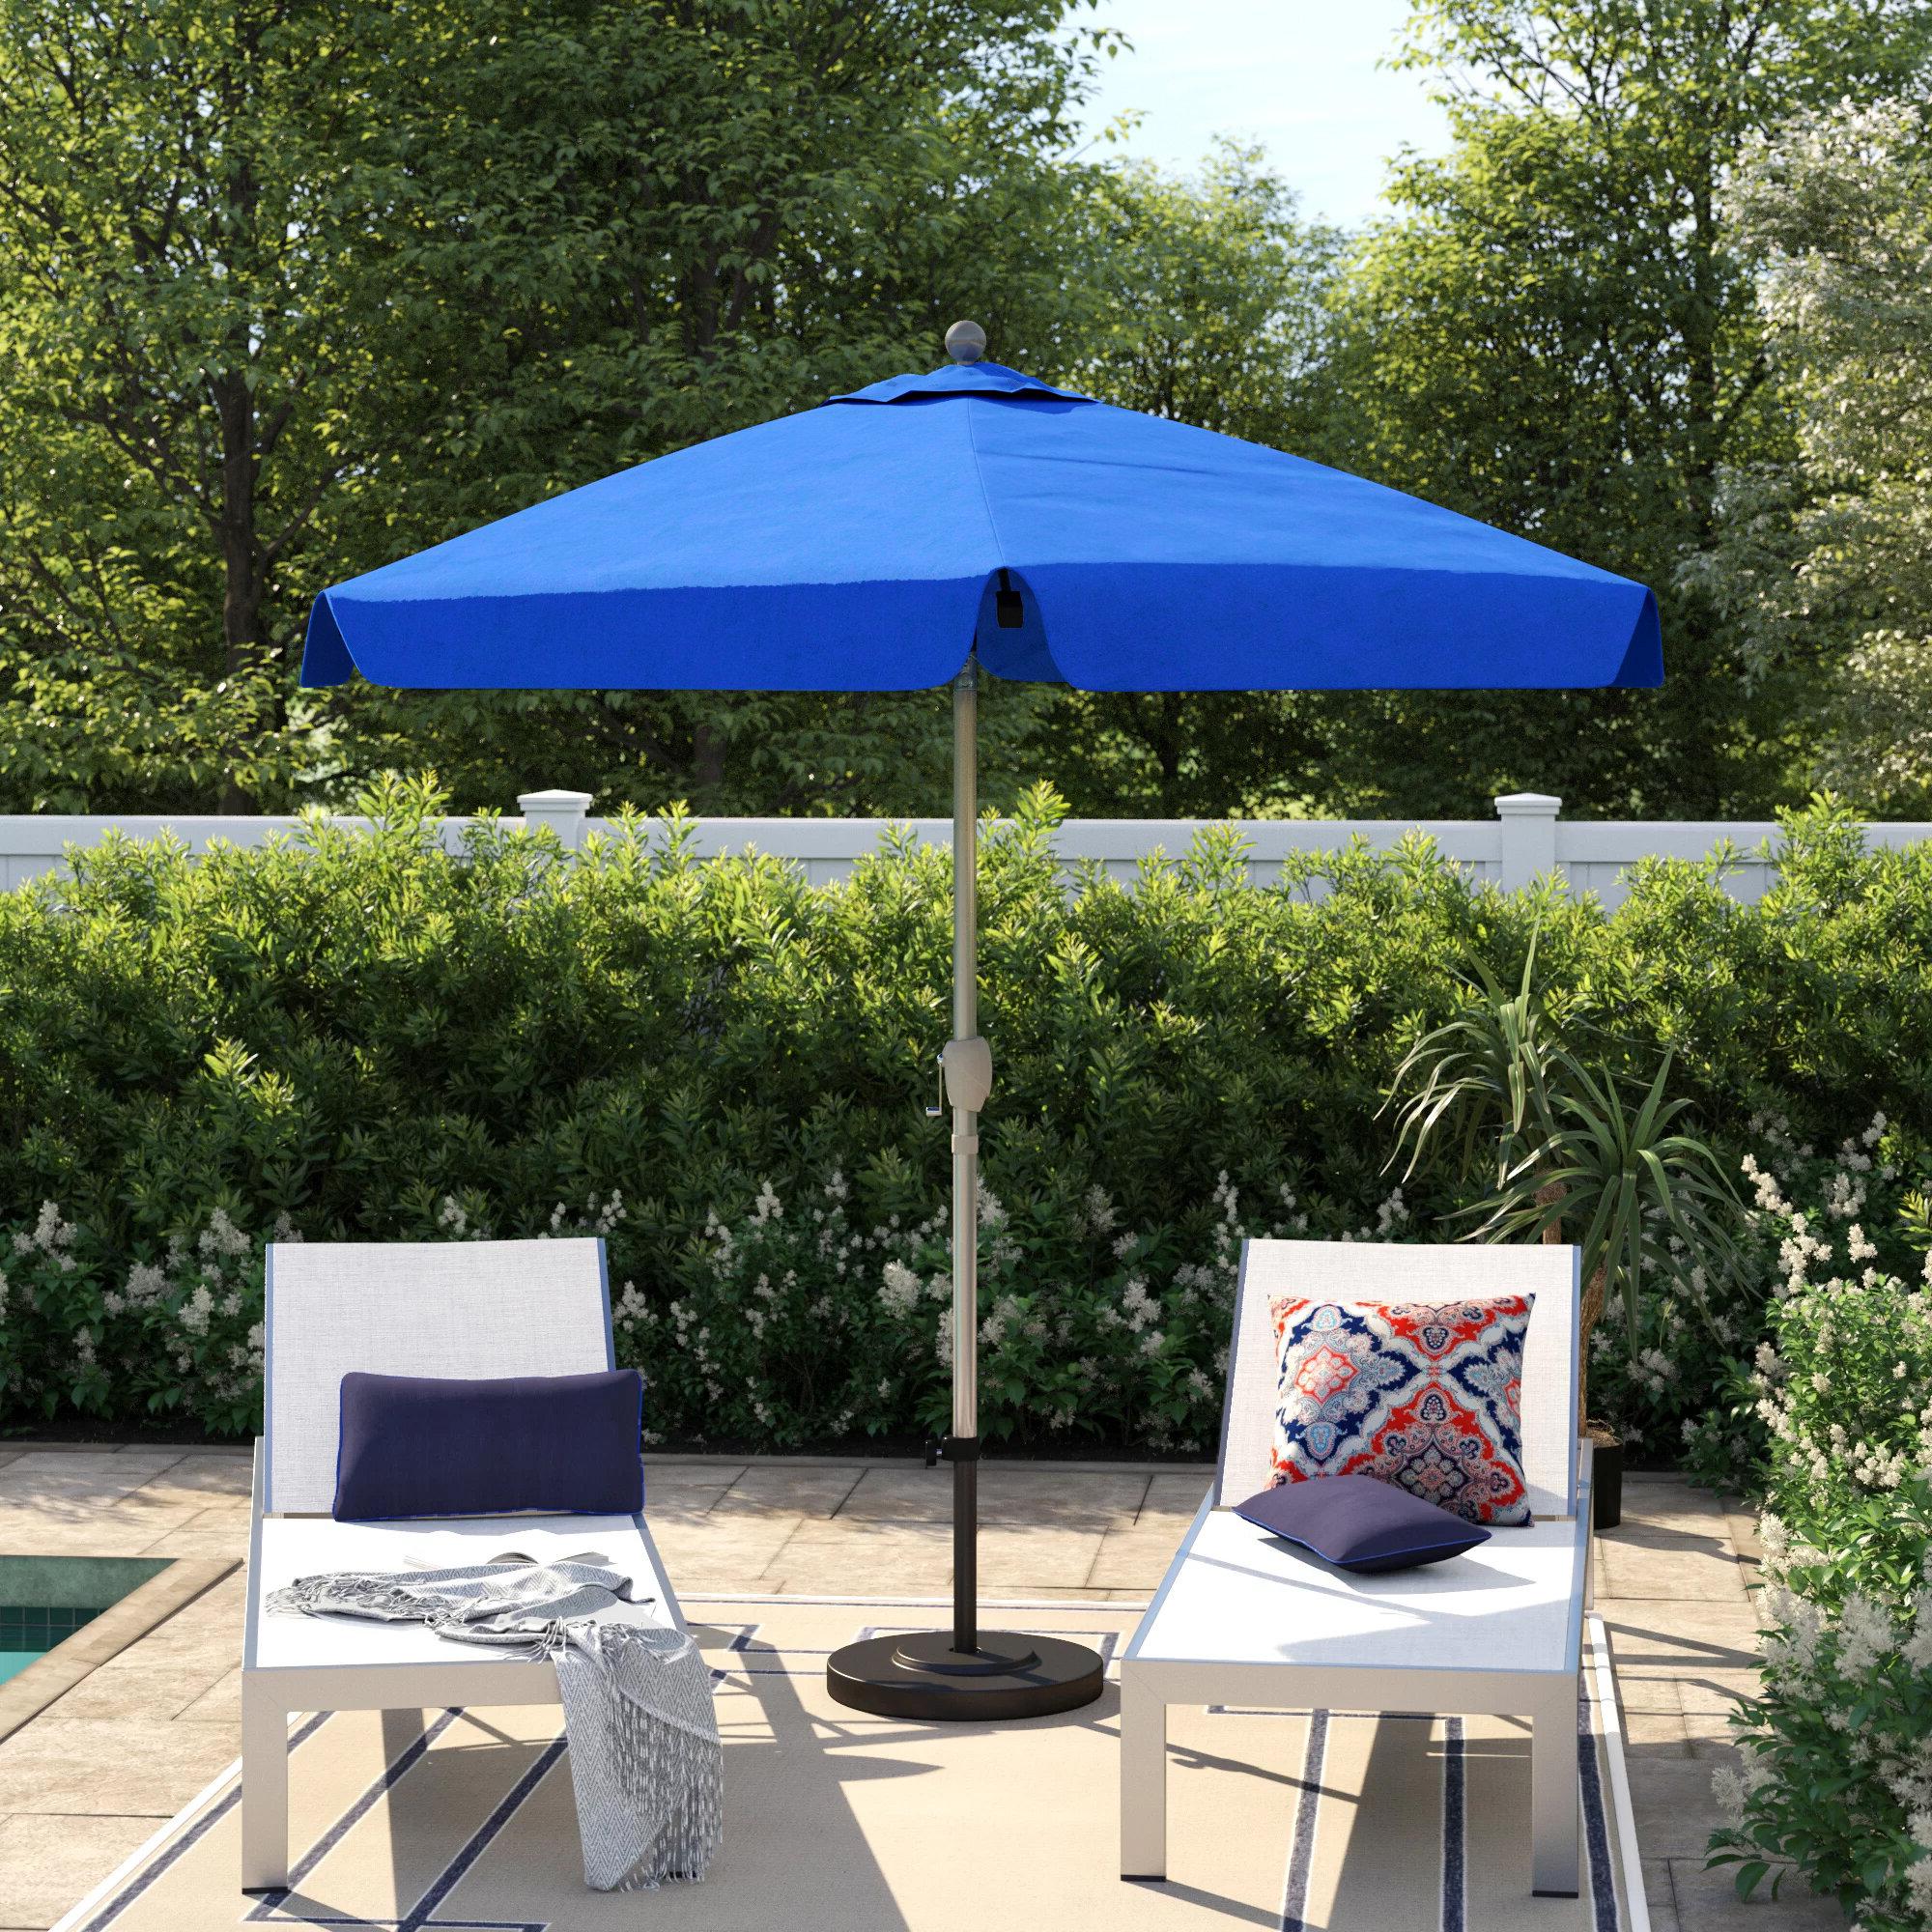 Most Recent Capresa 7.5' Market Umbrella Pertaining To Allport Market Umbrellas (Gallery 8 of 20)